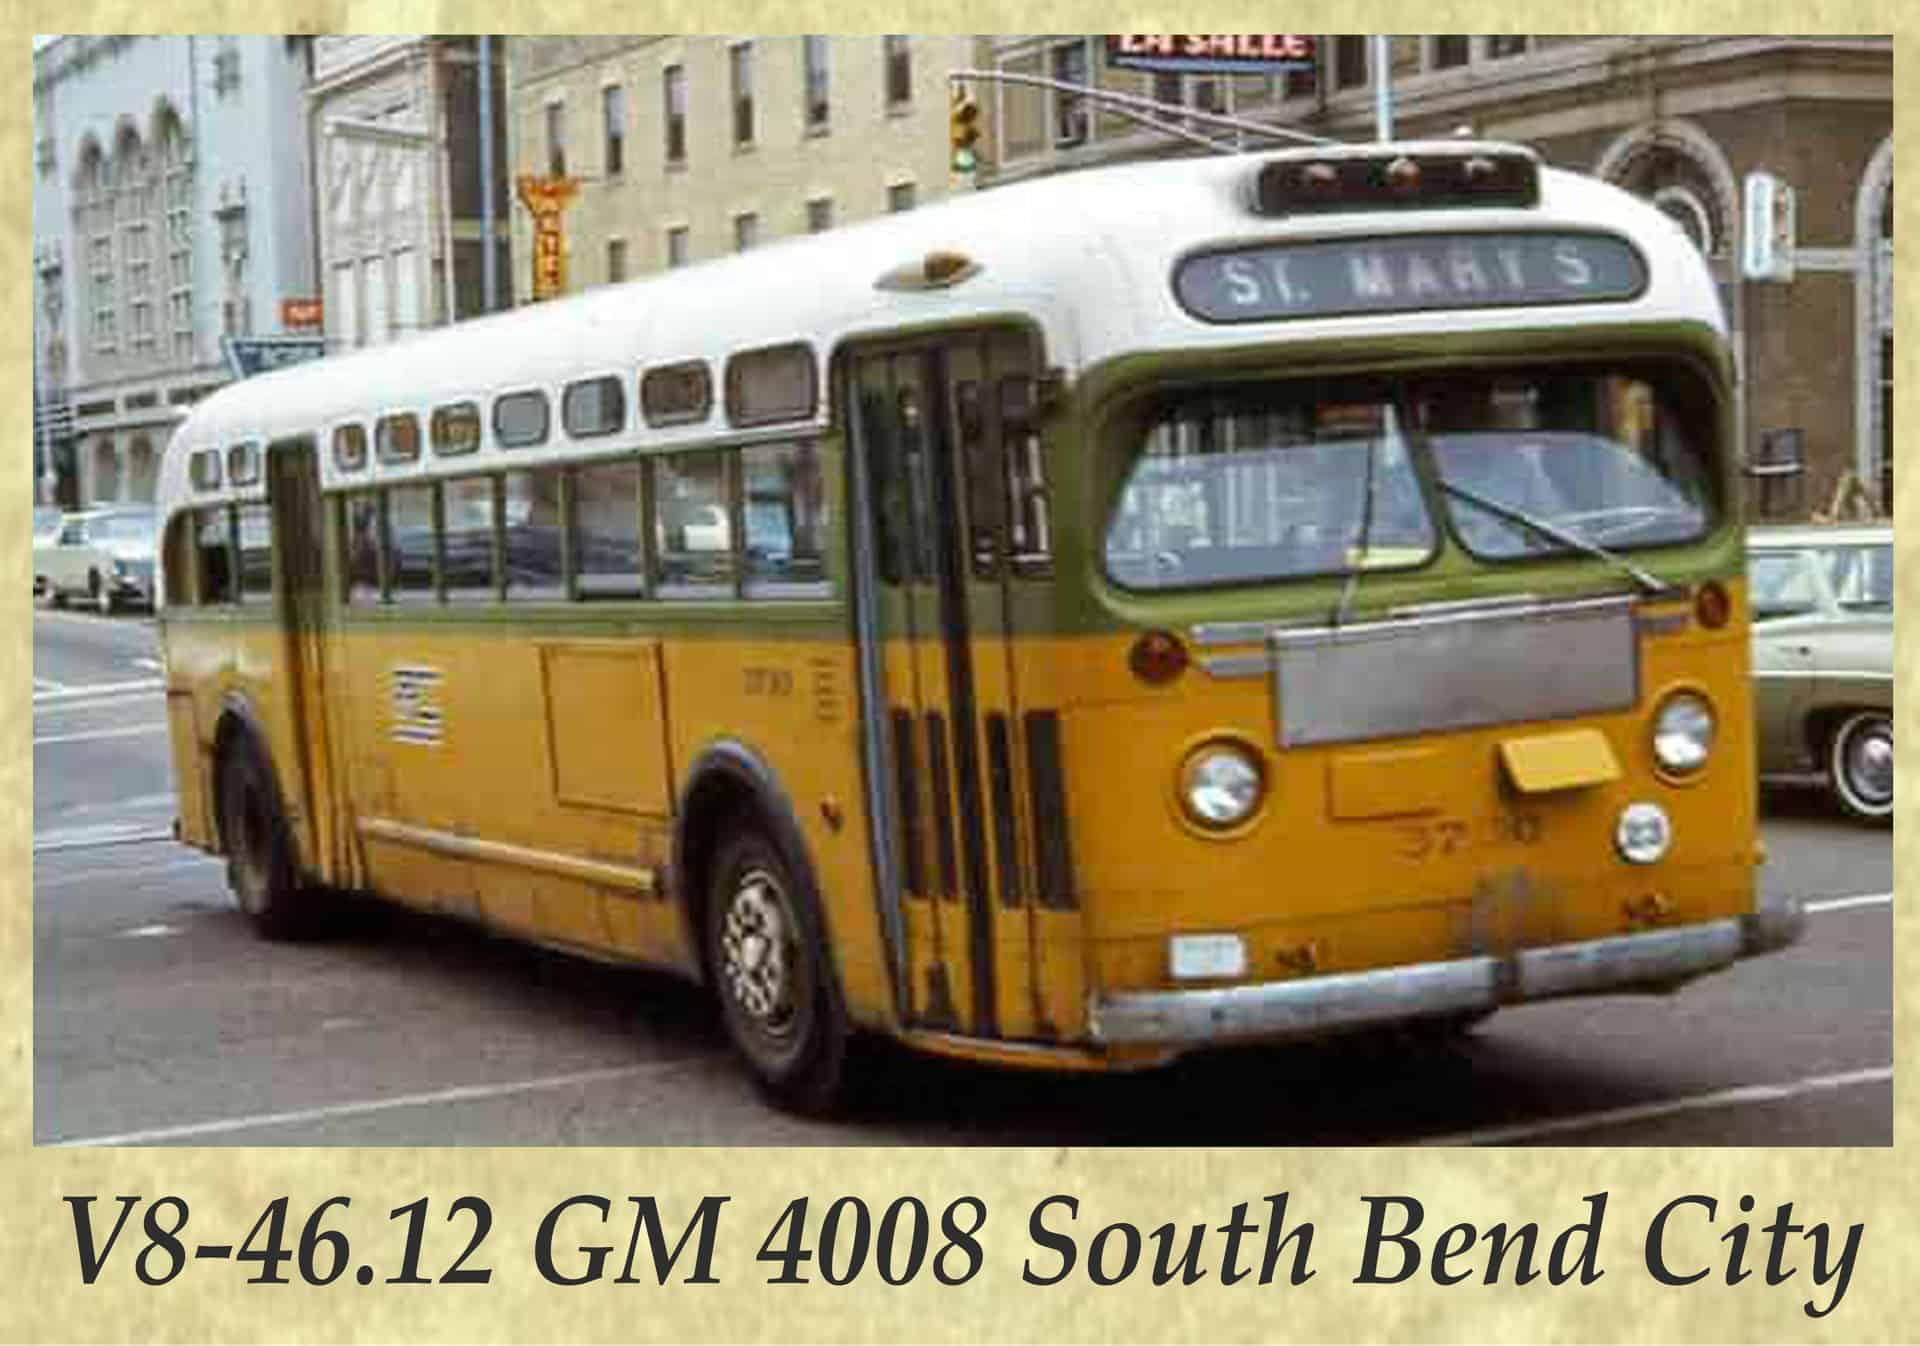 V8-46.12 GM 4008 South Bend City